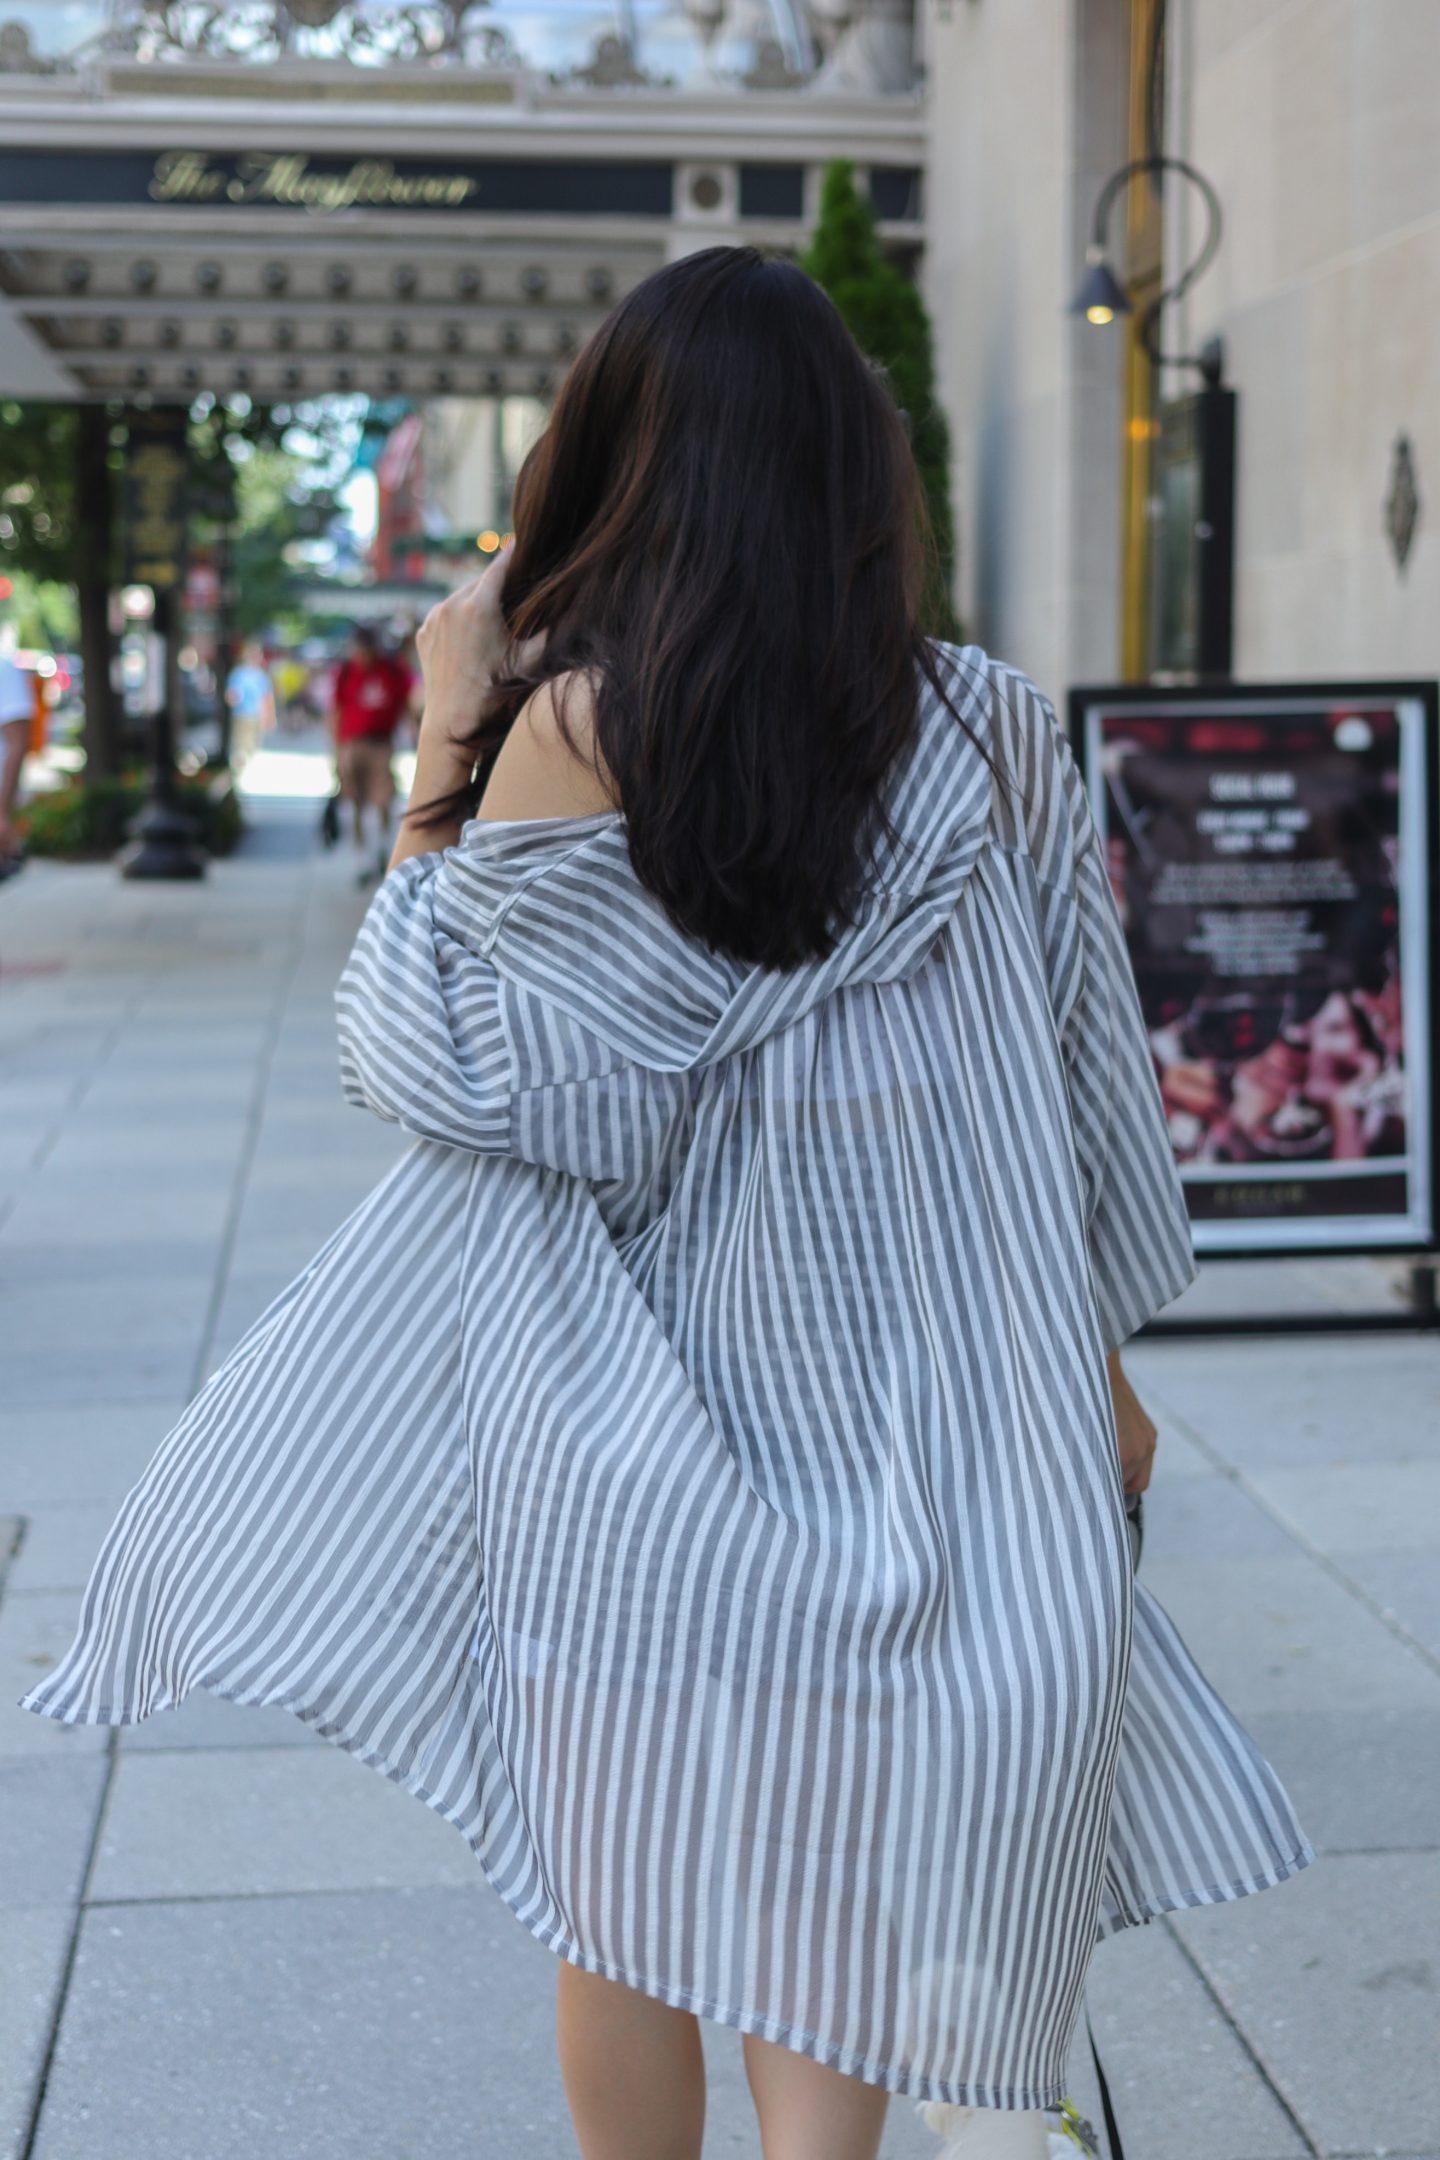 gray striped top